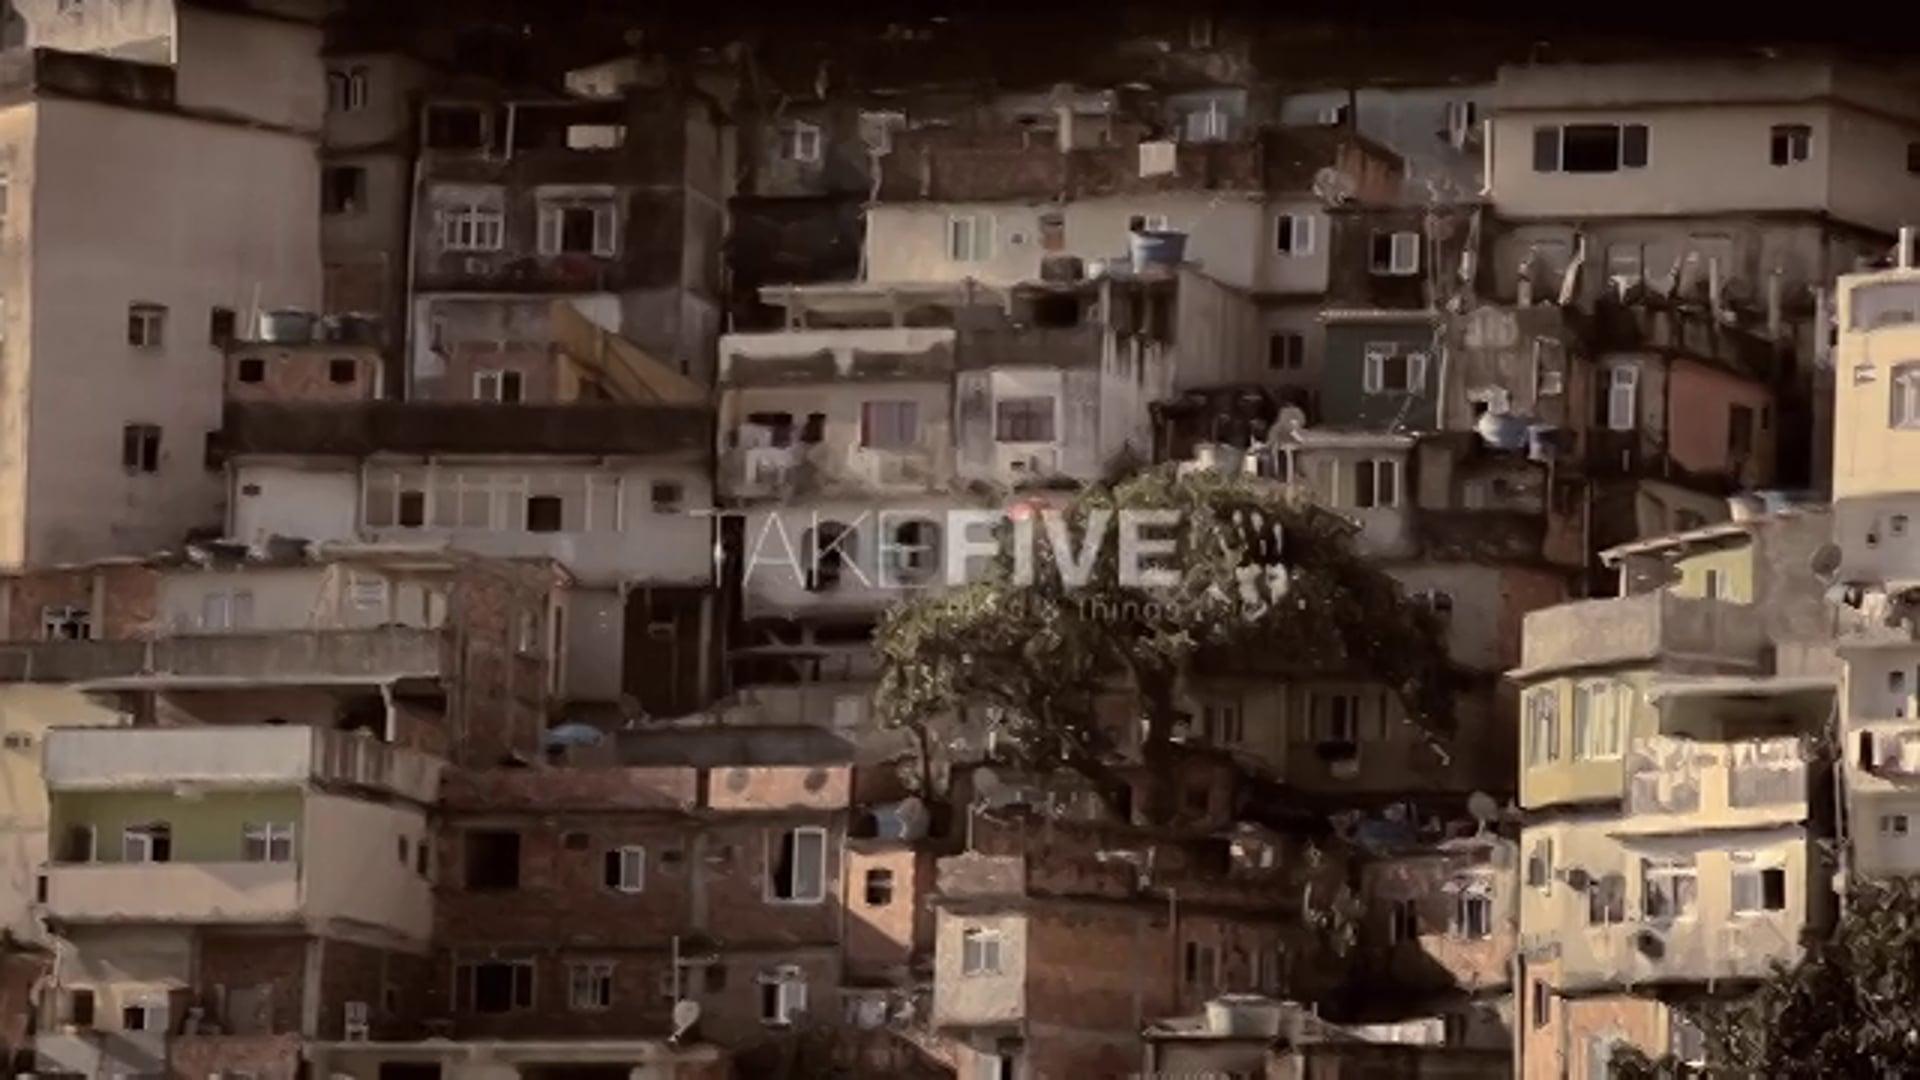 Take Five - Rocinha